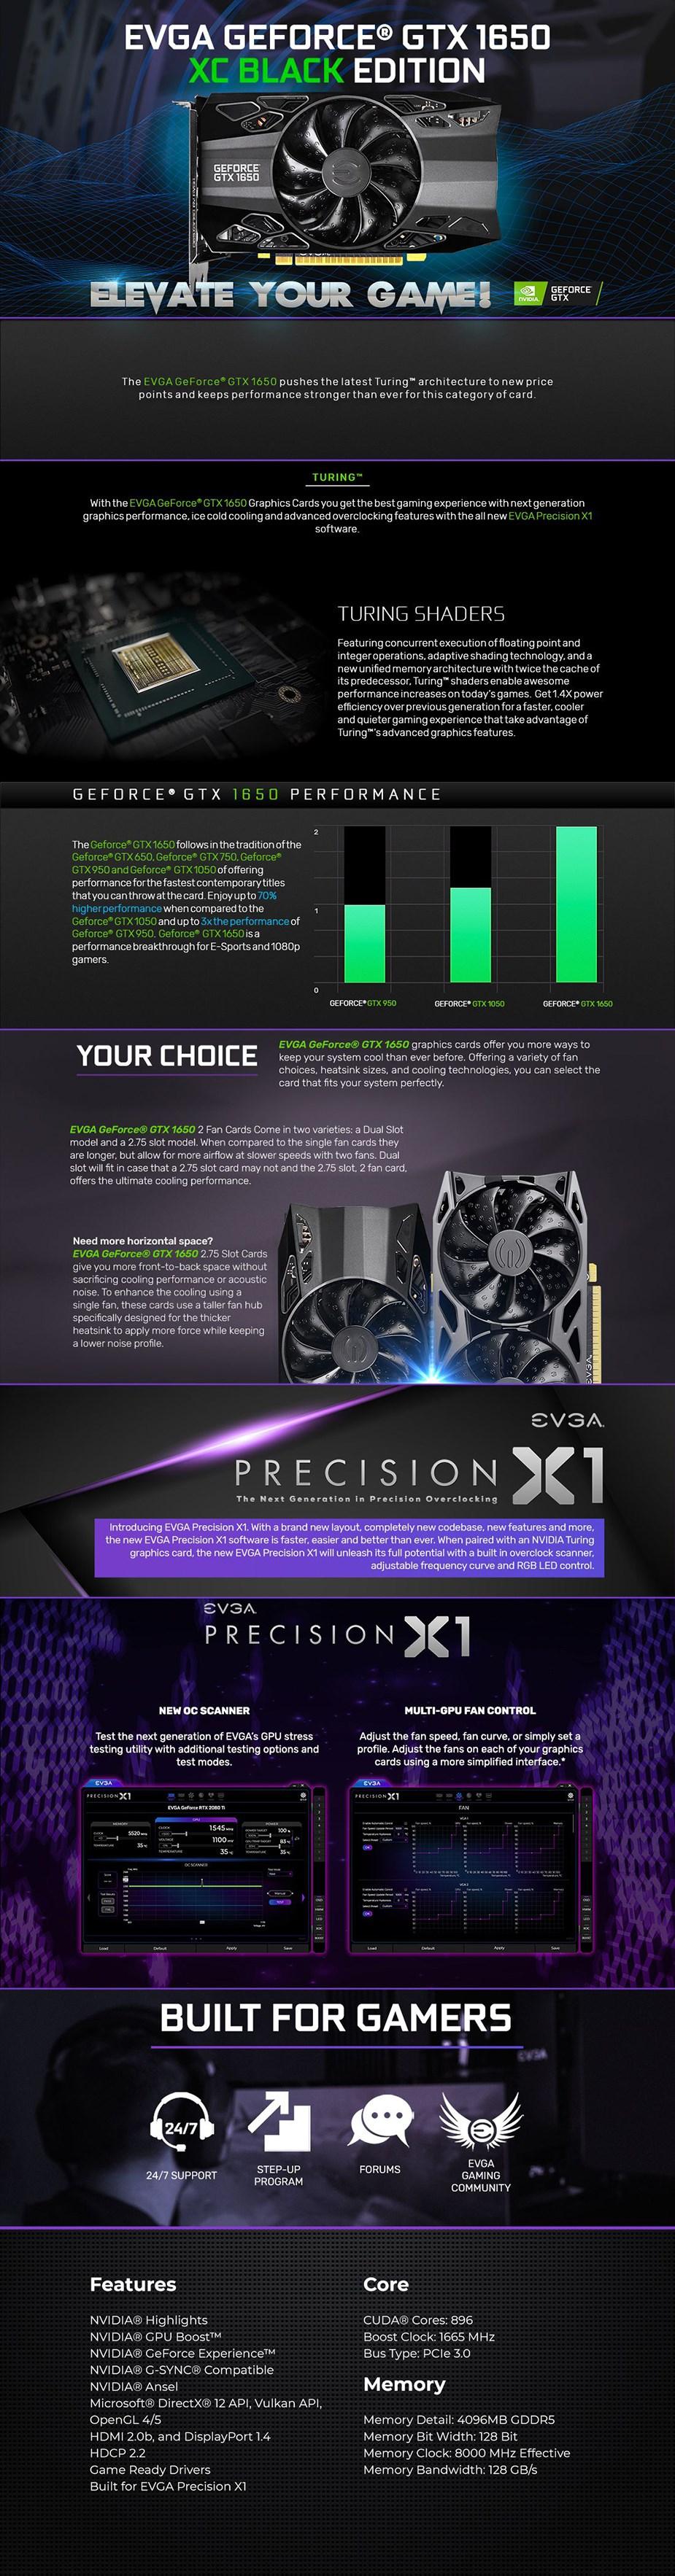 EVGA GeForce GTX 1650 XC Black GAMING 4GB Video Card - Overview 1